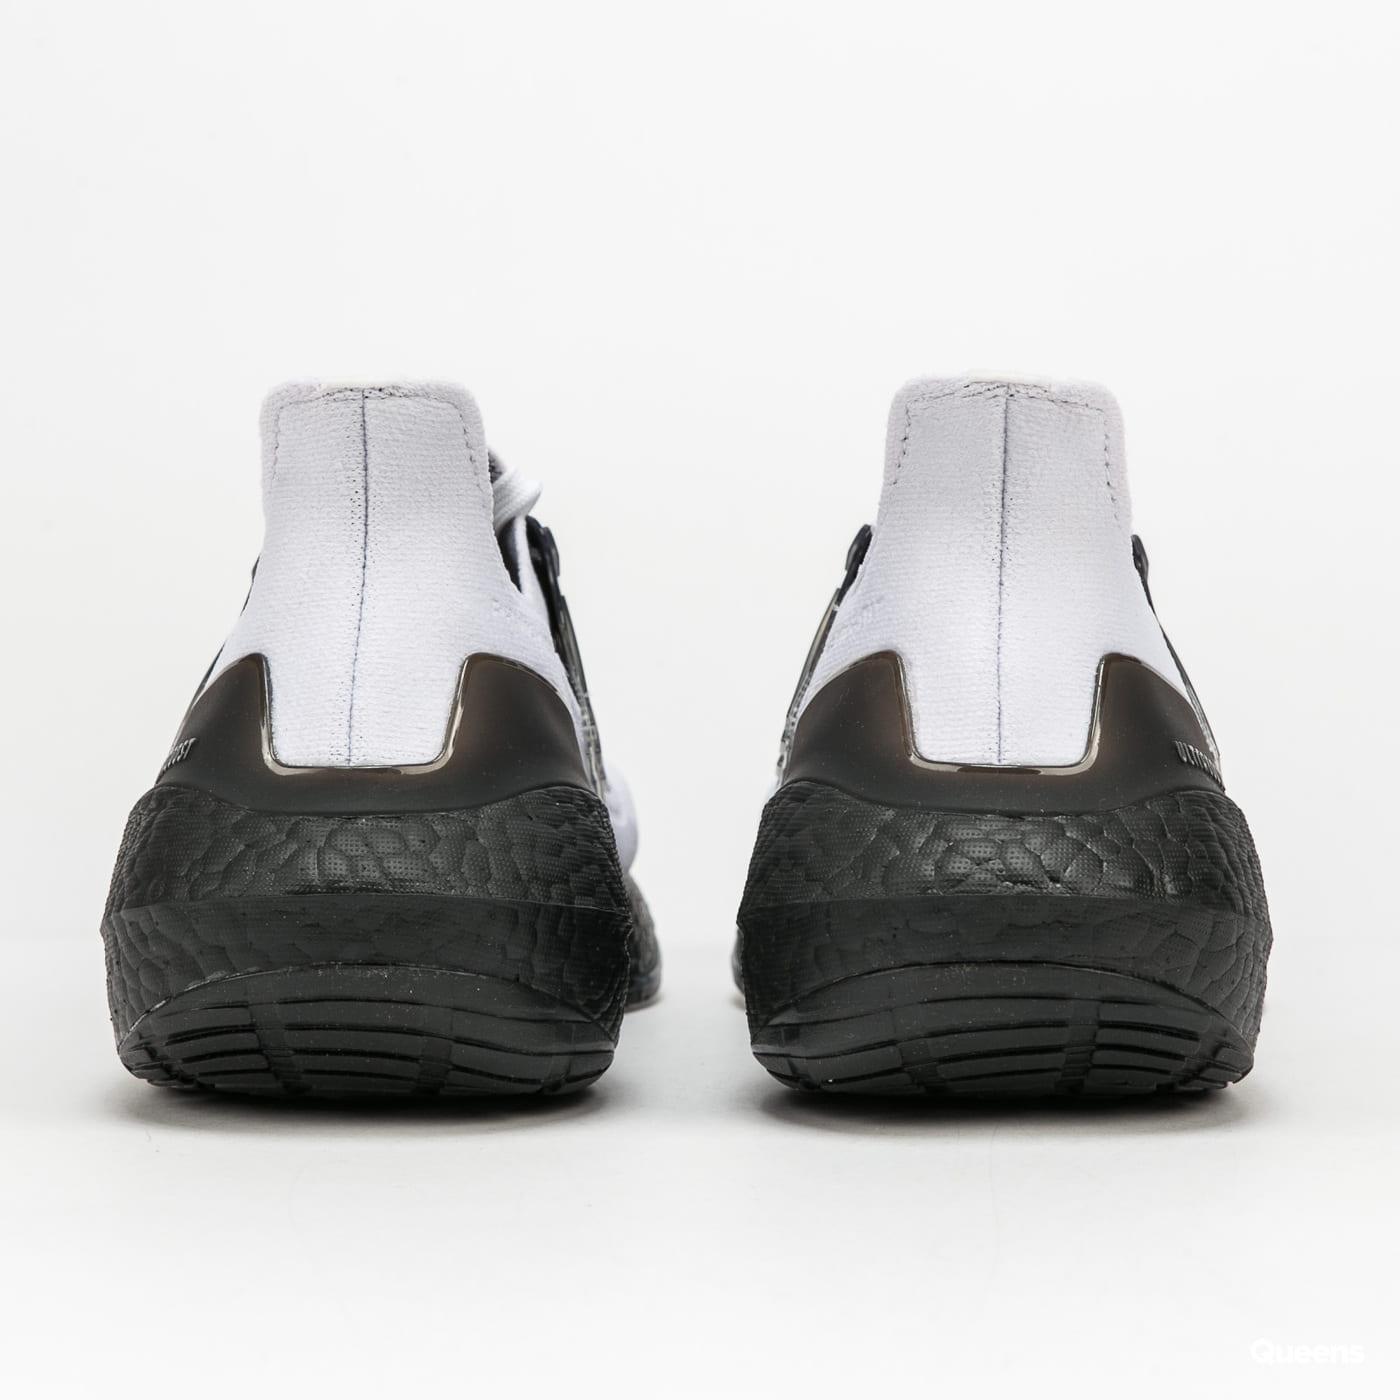 adidas Performance Ultraboost 21 ftwwht / cblack / grefiv